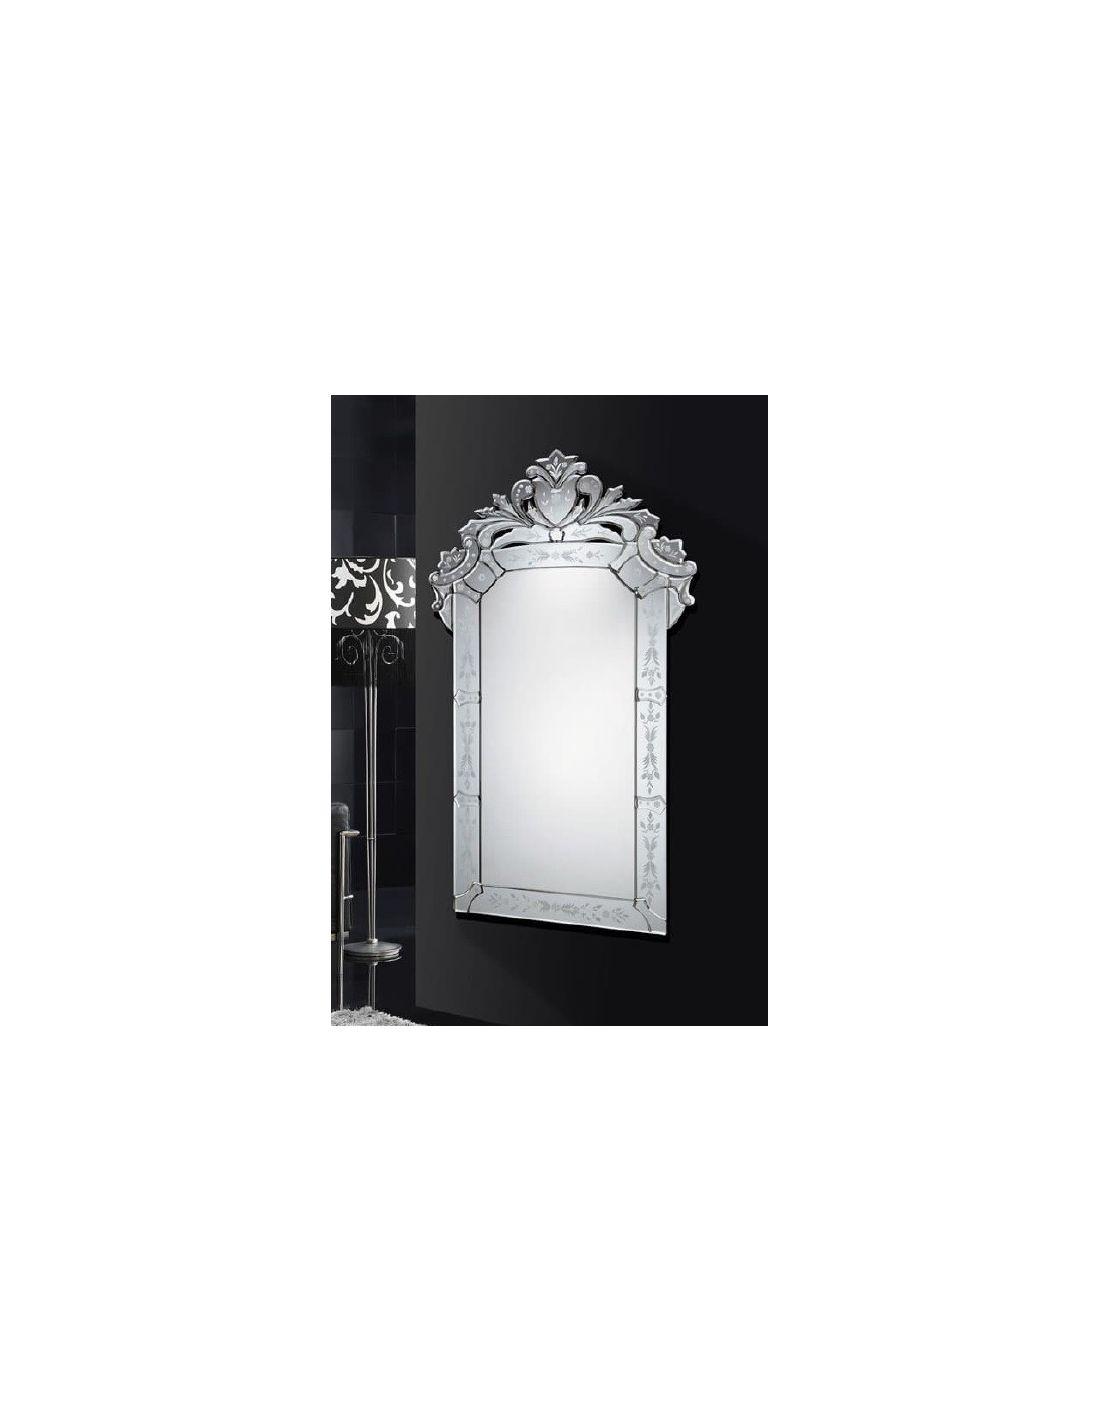 Espejos venecianos env o gratis for Espejos de pared baratos online